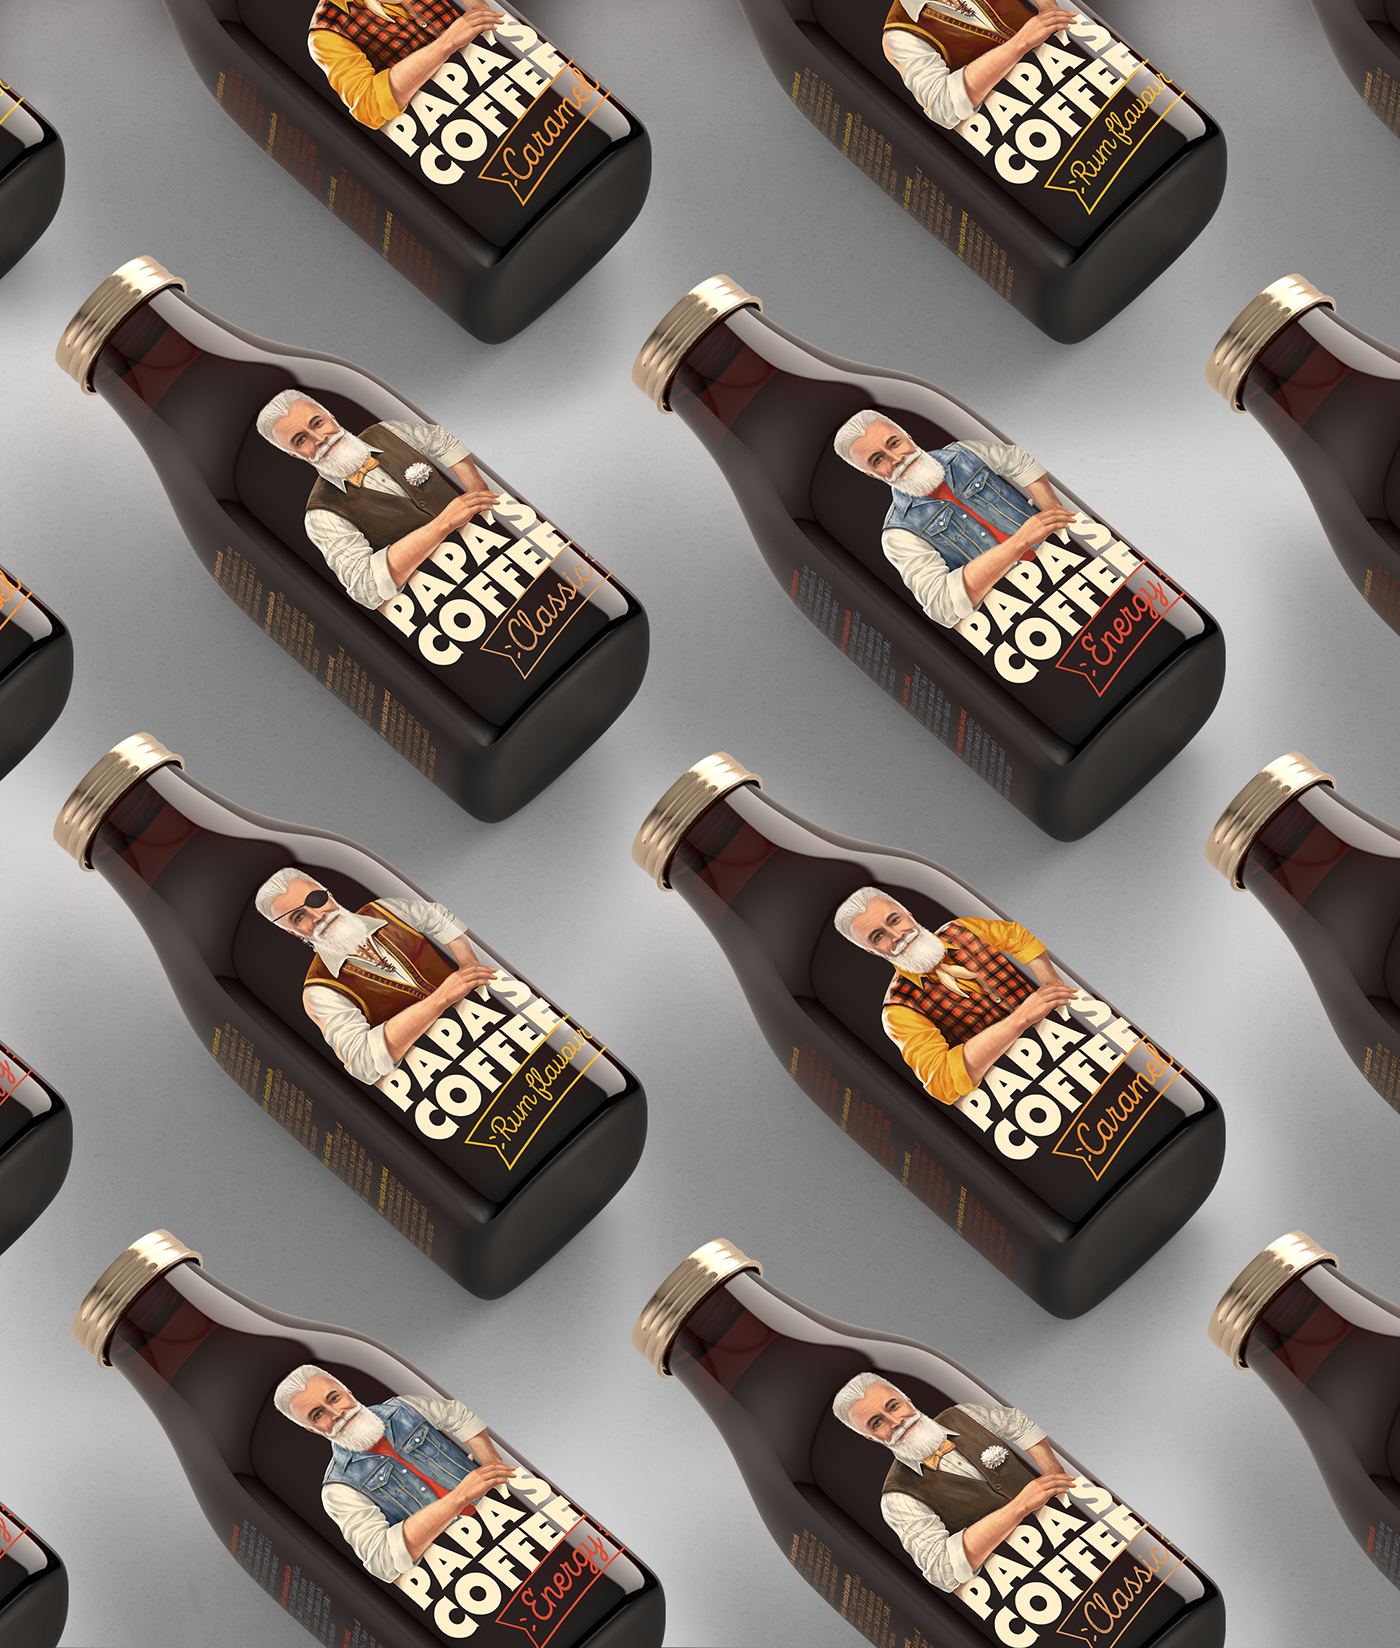 graphic design  ILLUSTRATION  Packaging design Coffee Label Hipster amoth amothdesign amothstudio